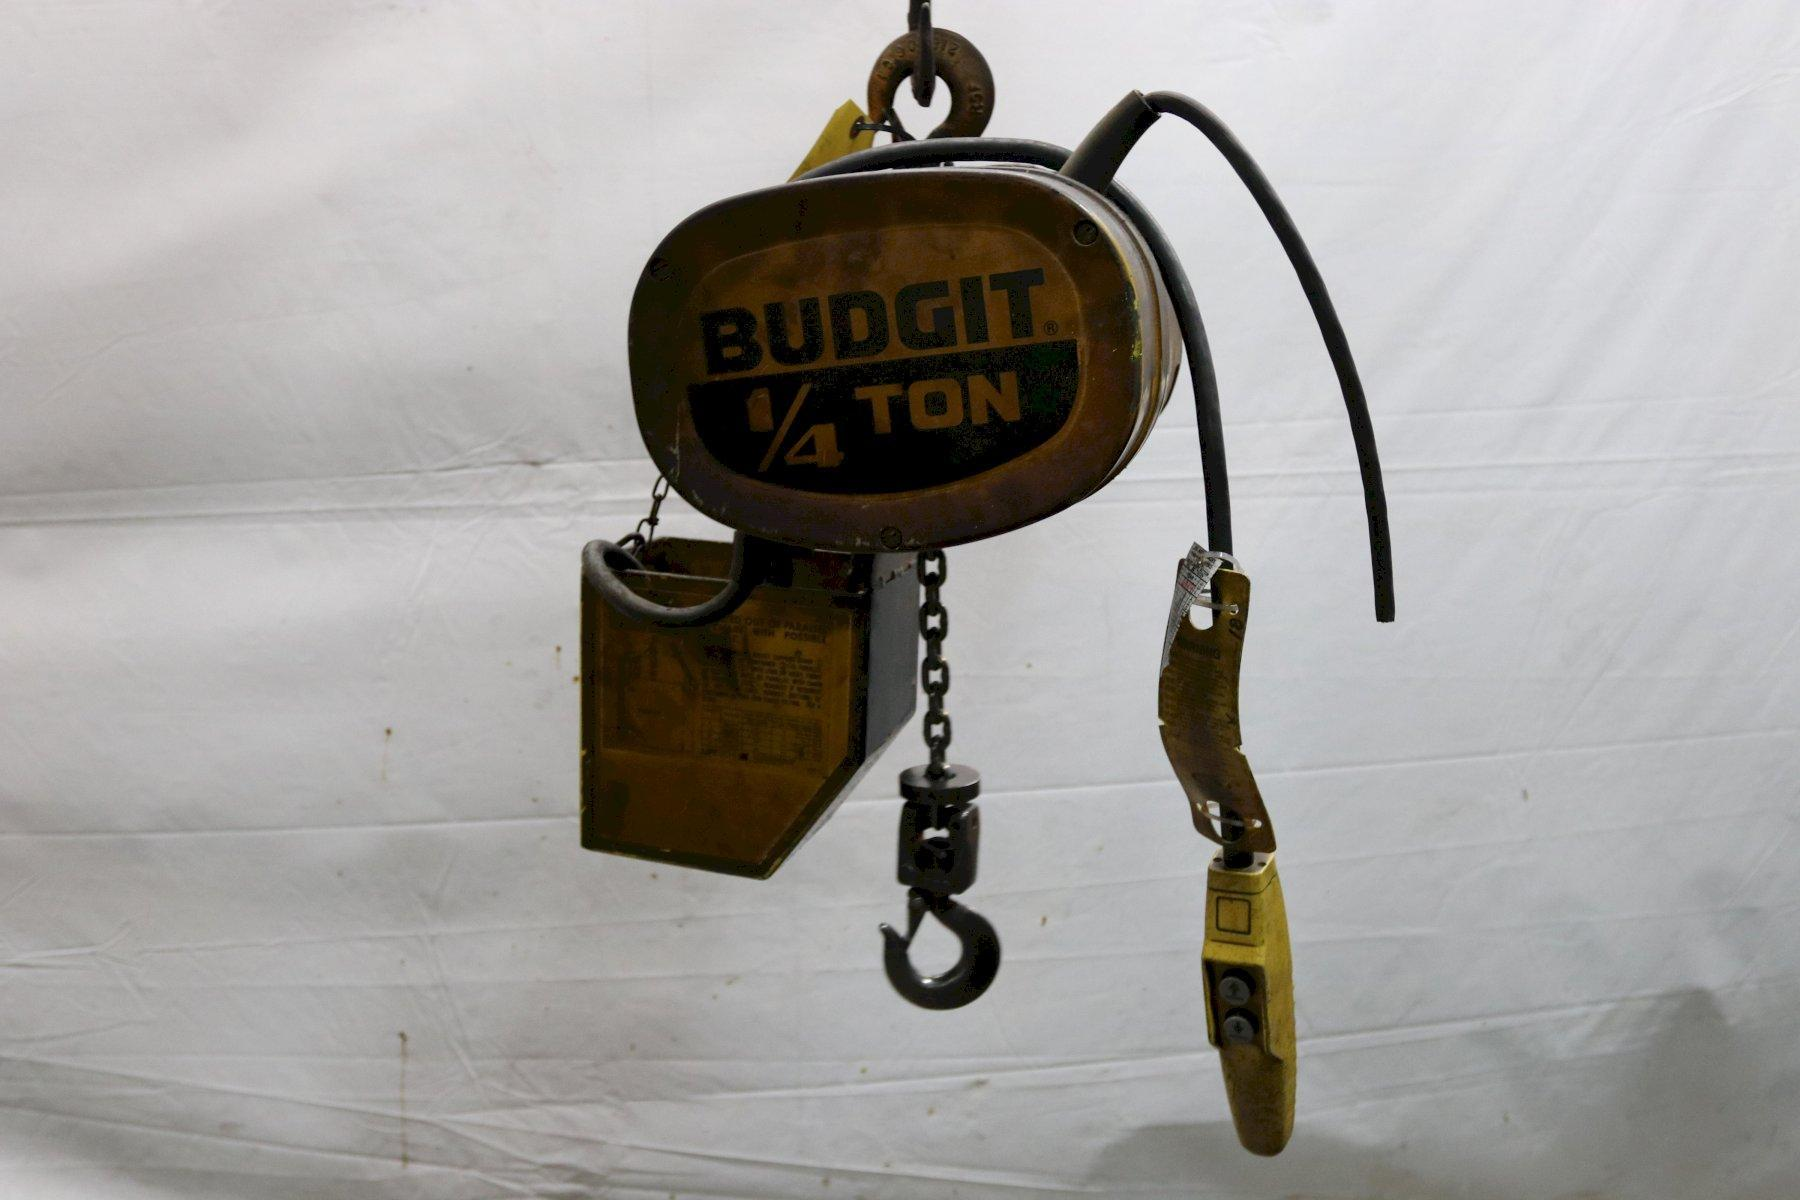 1/4 TON BUDGIT ELECTRIC CHAIN HOIST: STOCK #11998